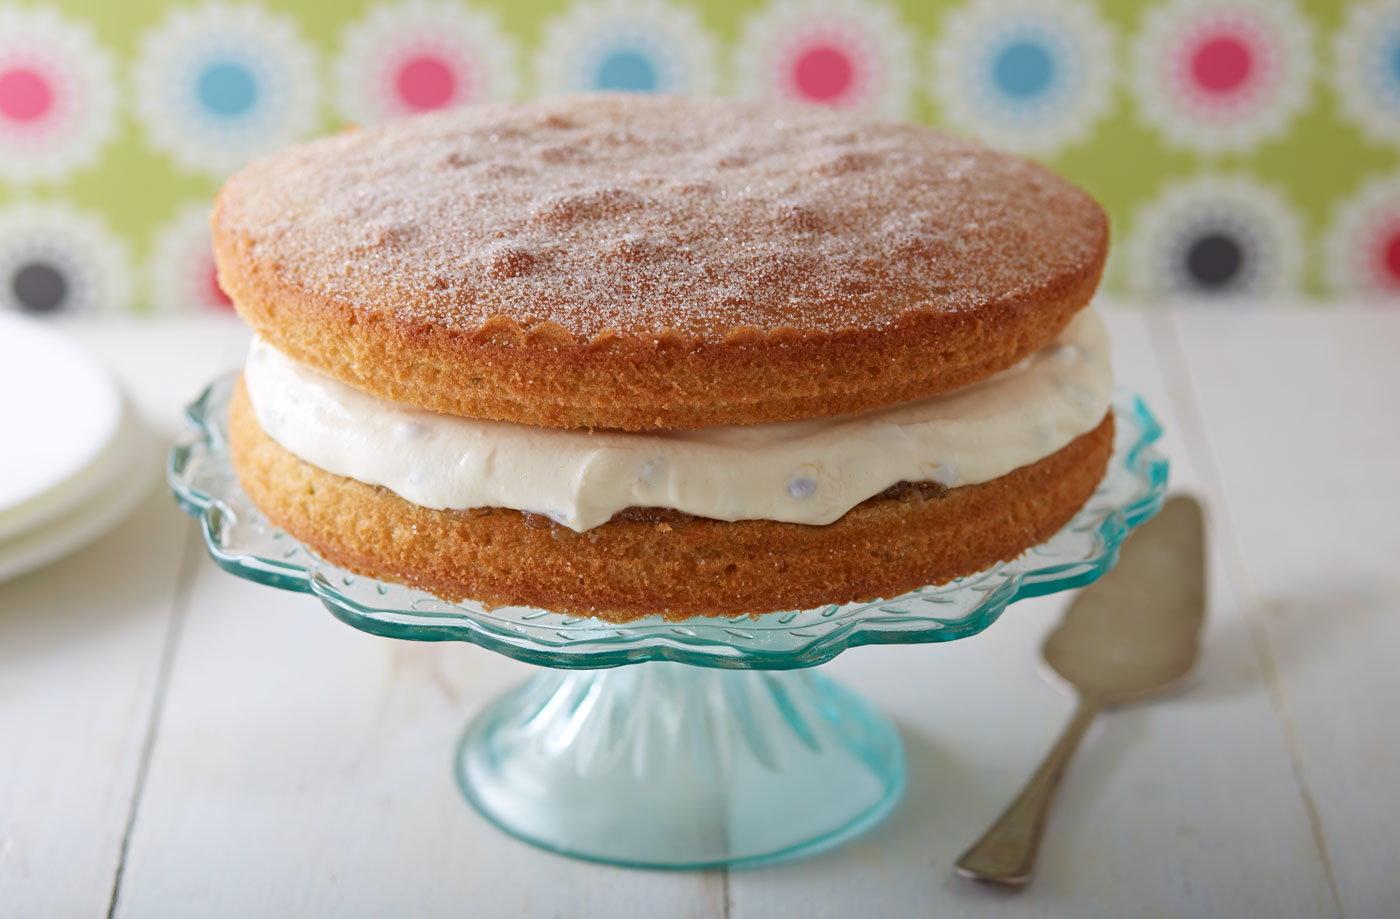 Best Sponge Cake Recipes Uk: Passion Fruit And Lime Victoria Sponge